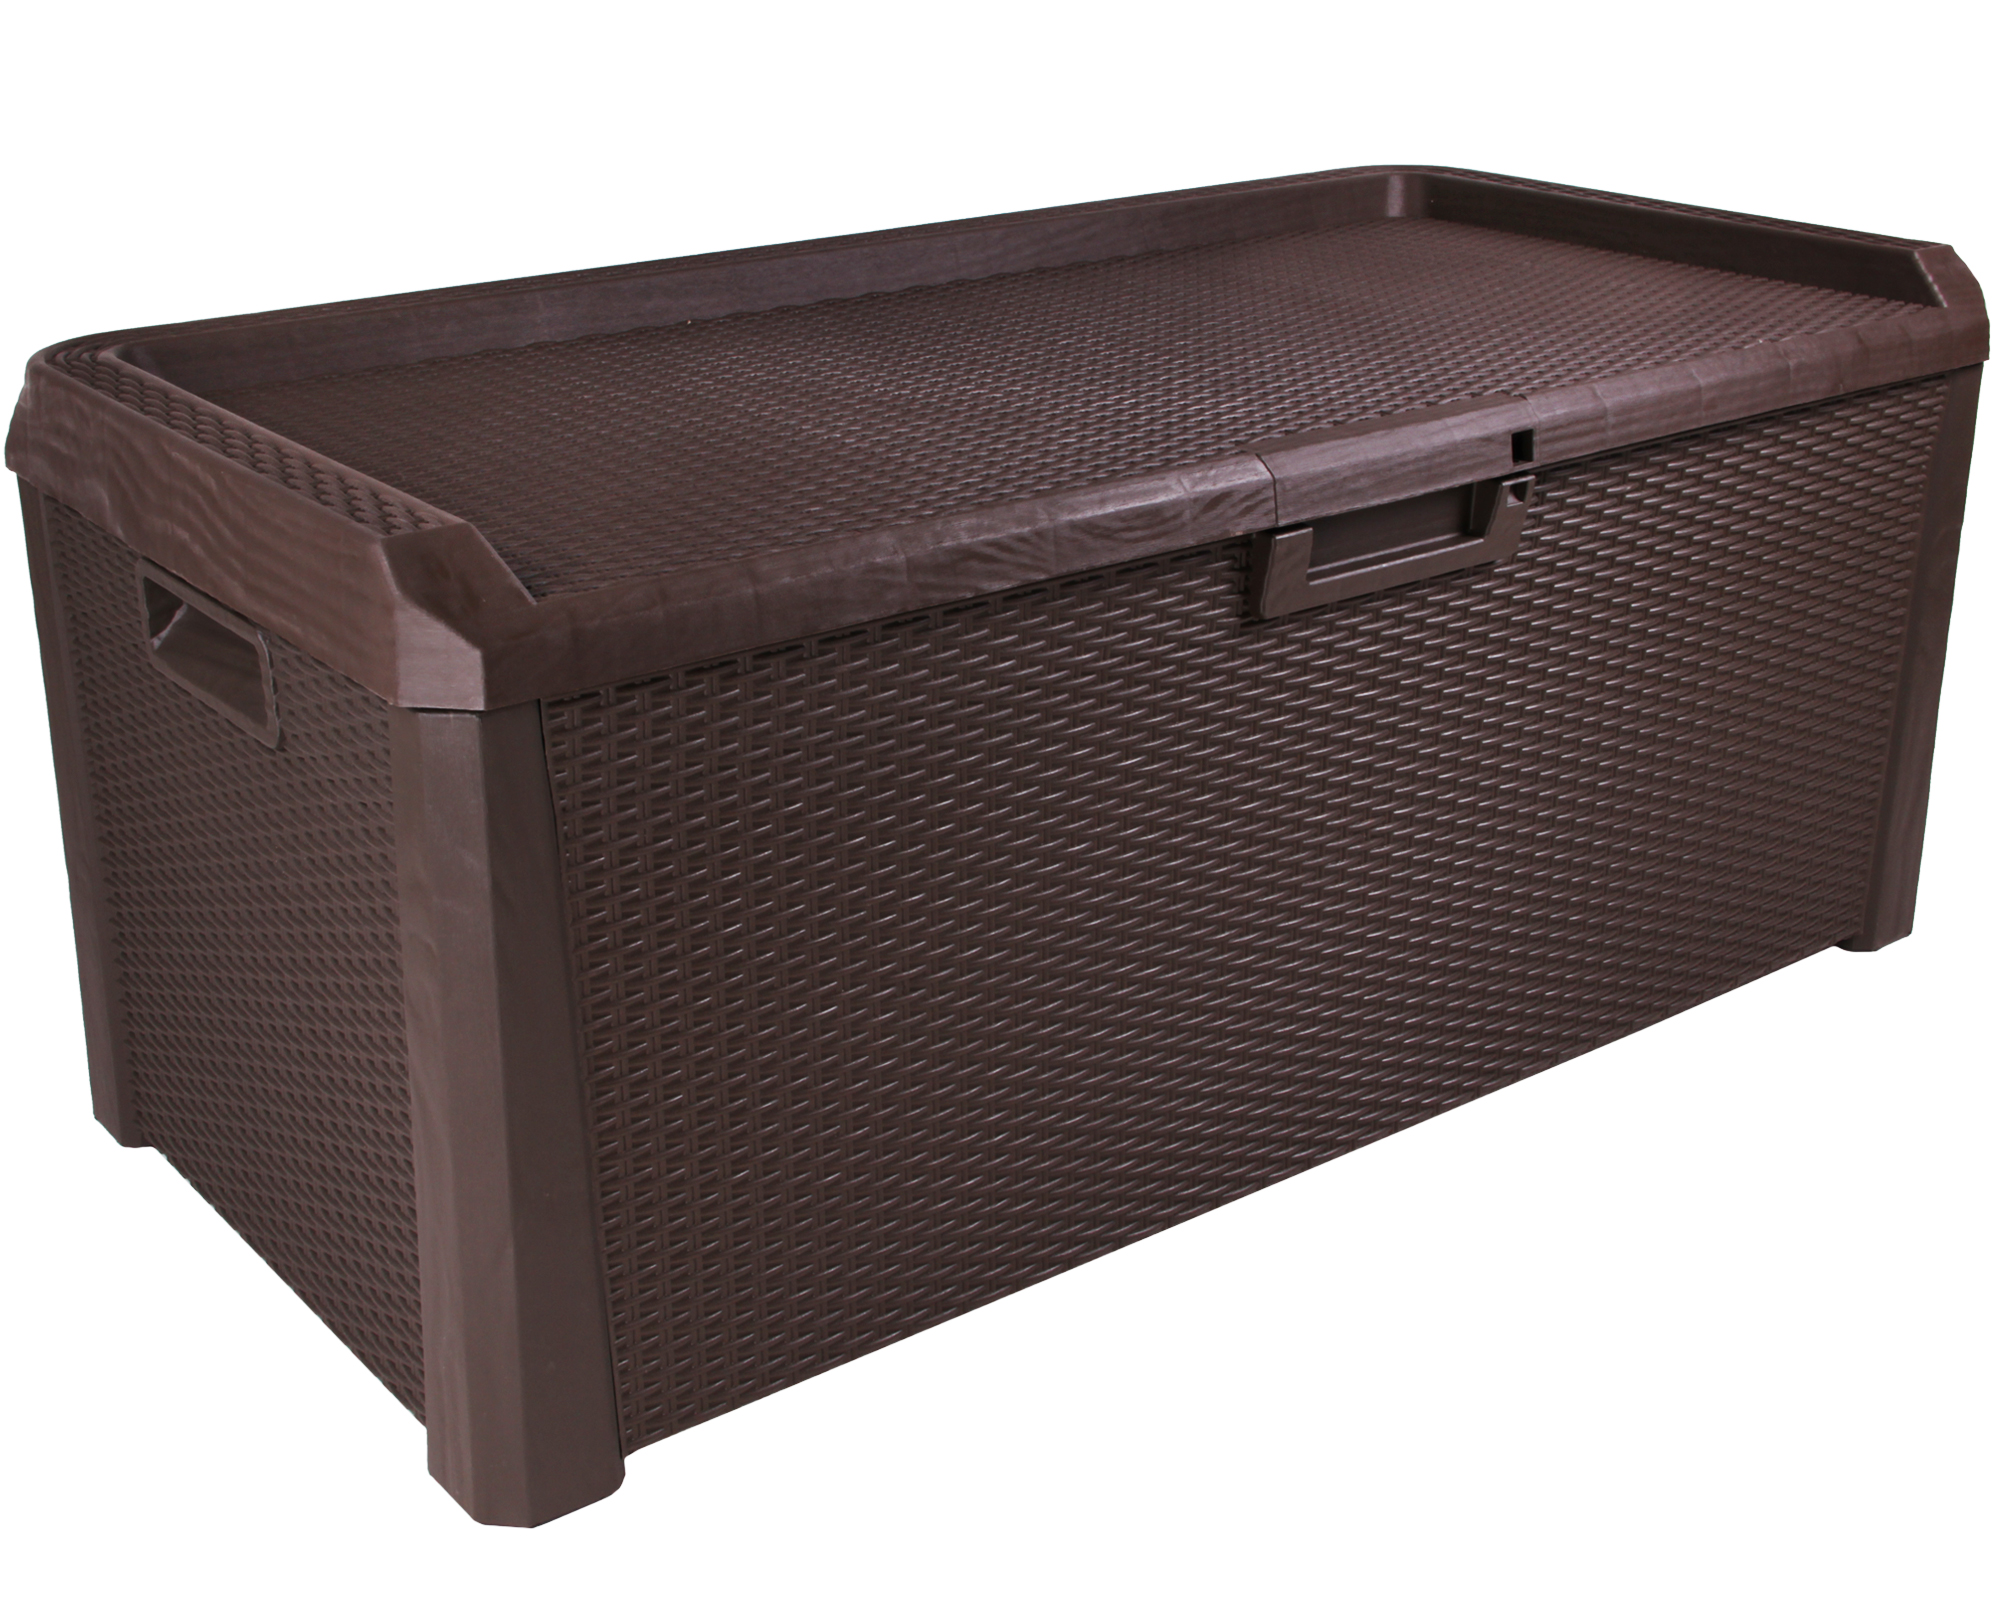 ondis24 kissenbox sitztruhe santo 560 l braun g nstig. Black Bedroom Furniture Sets. Home Design Ideas